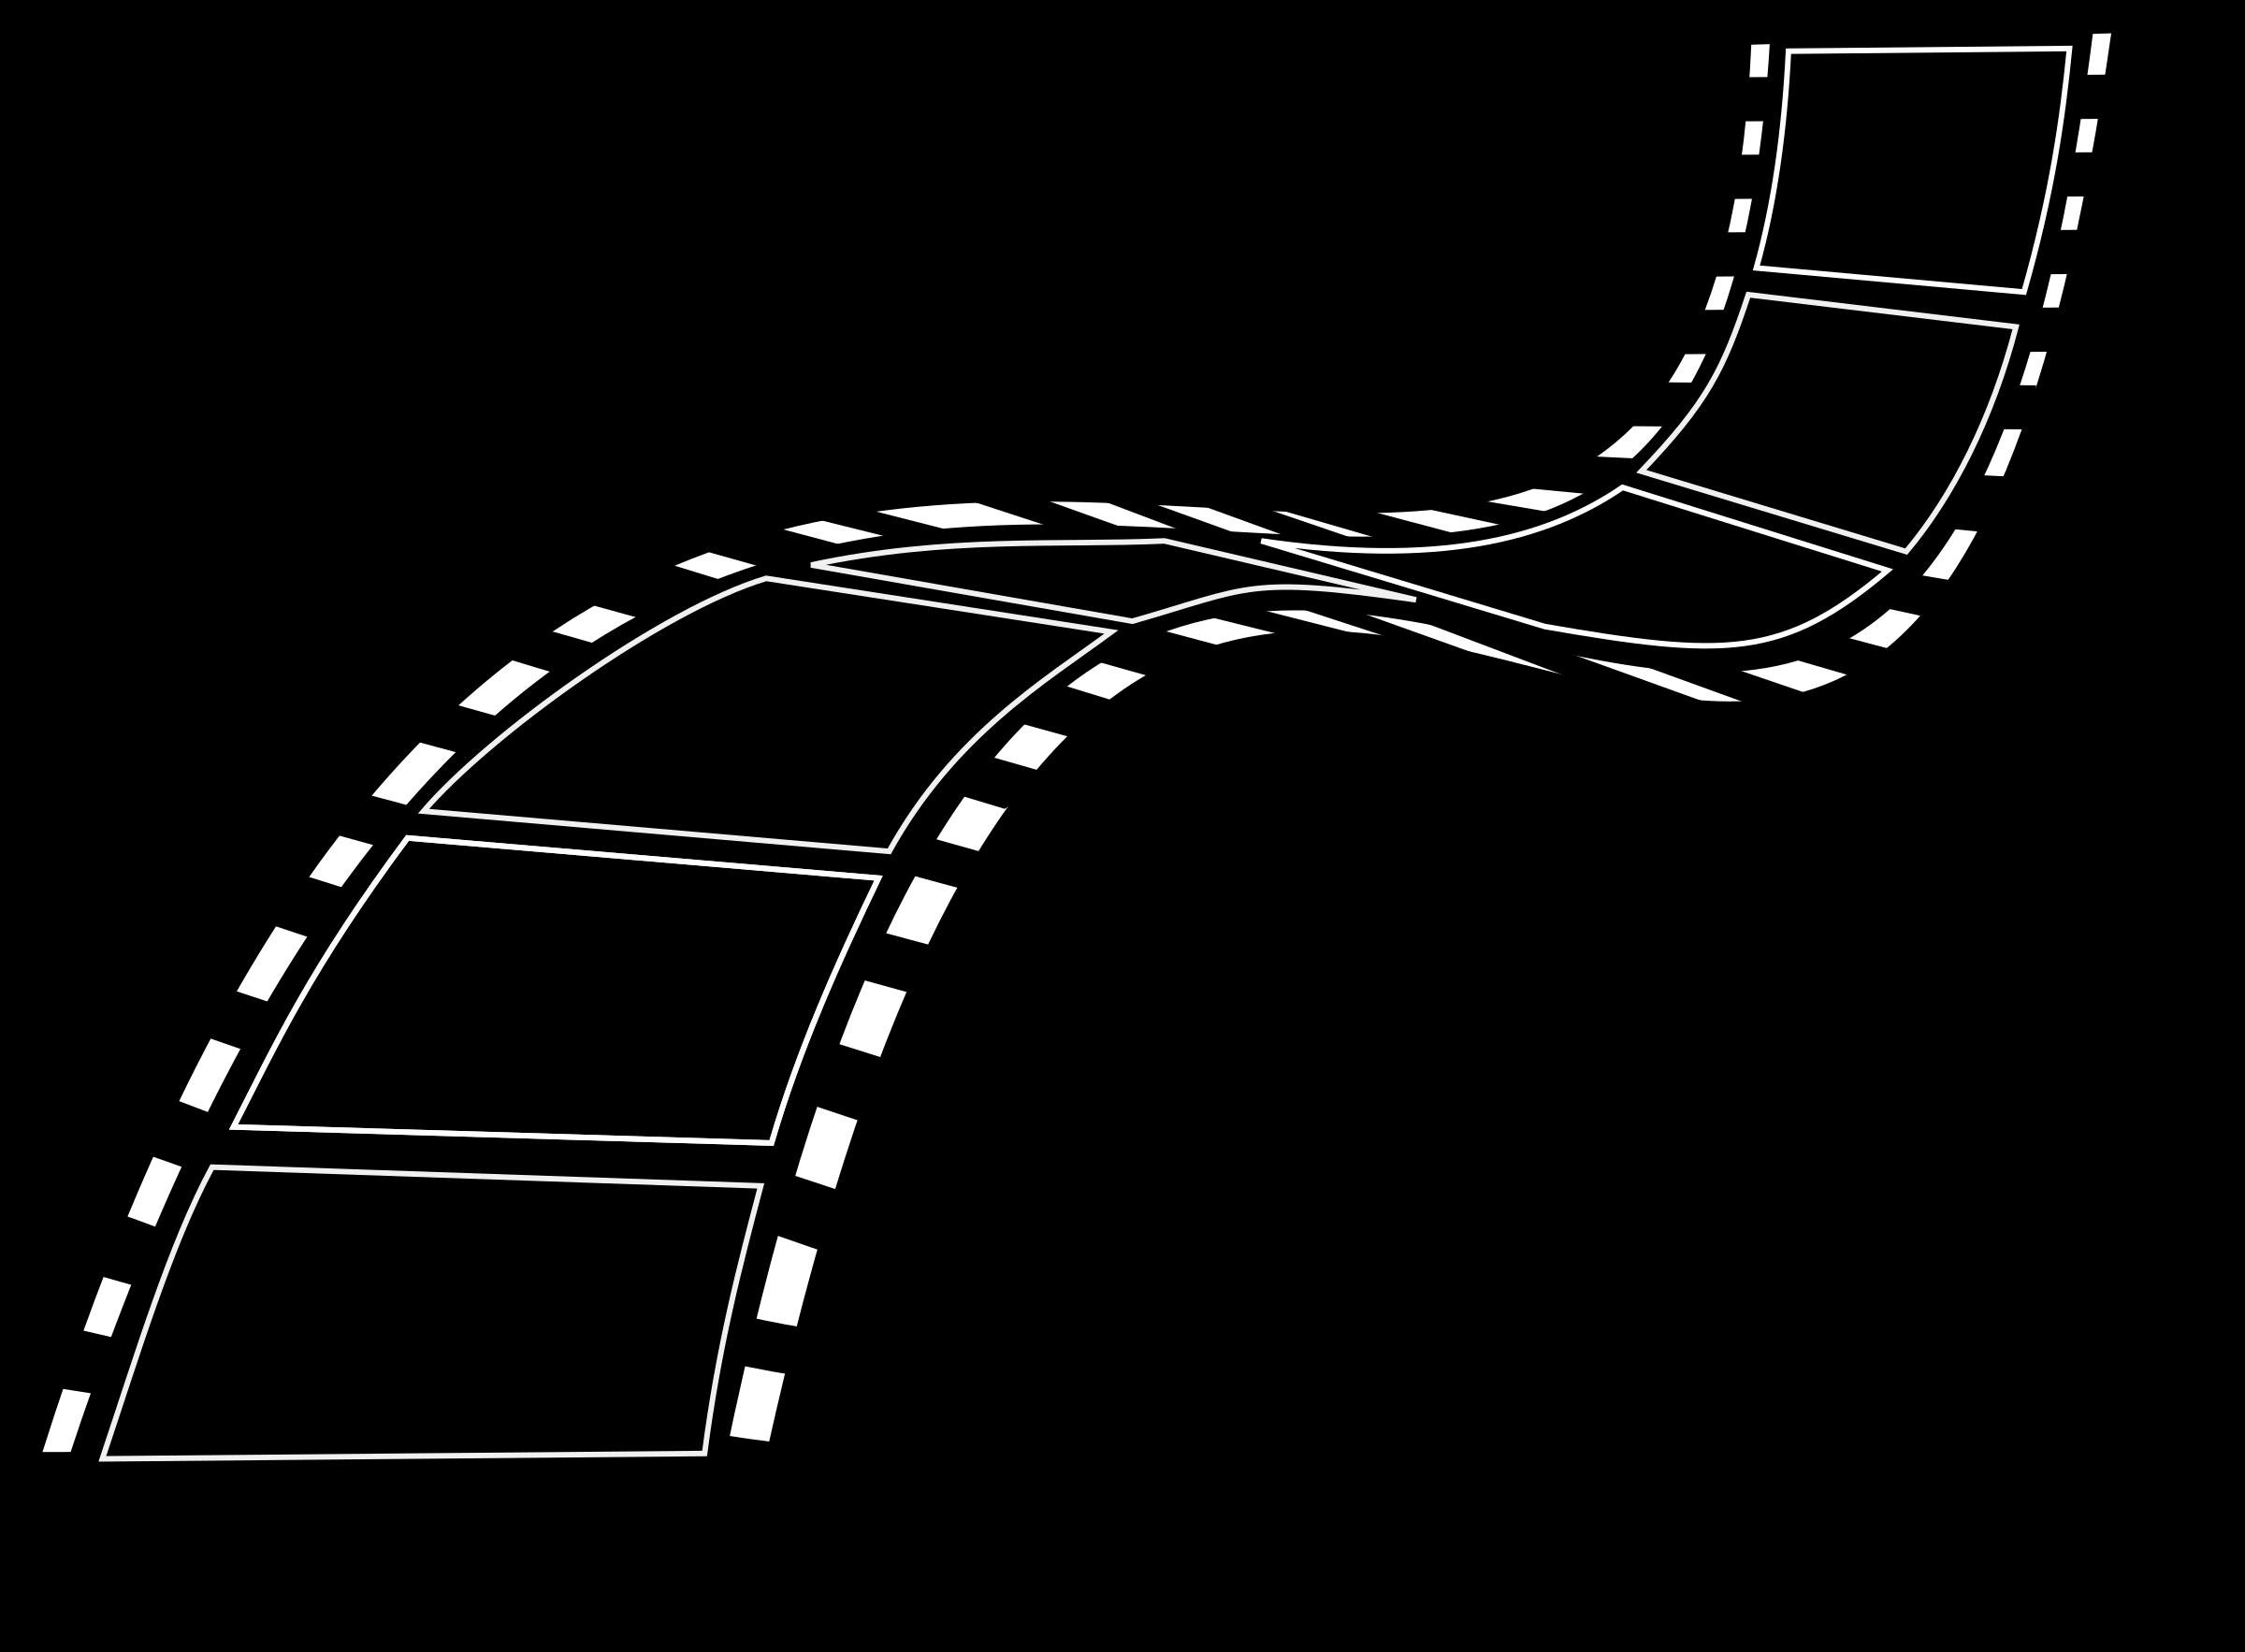 Film clipart film real. Strip big image png